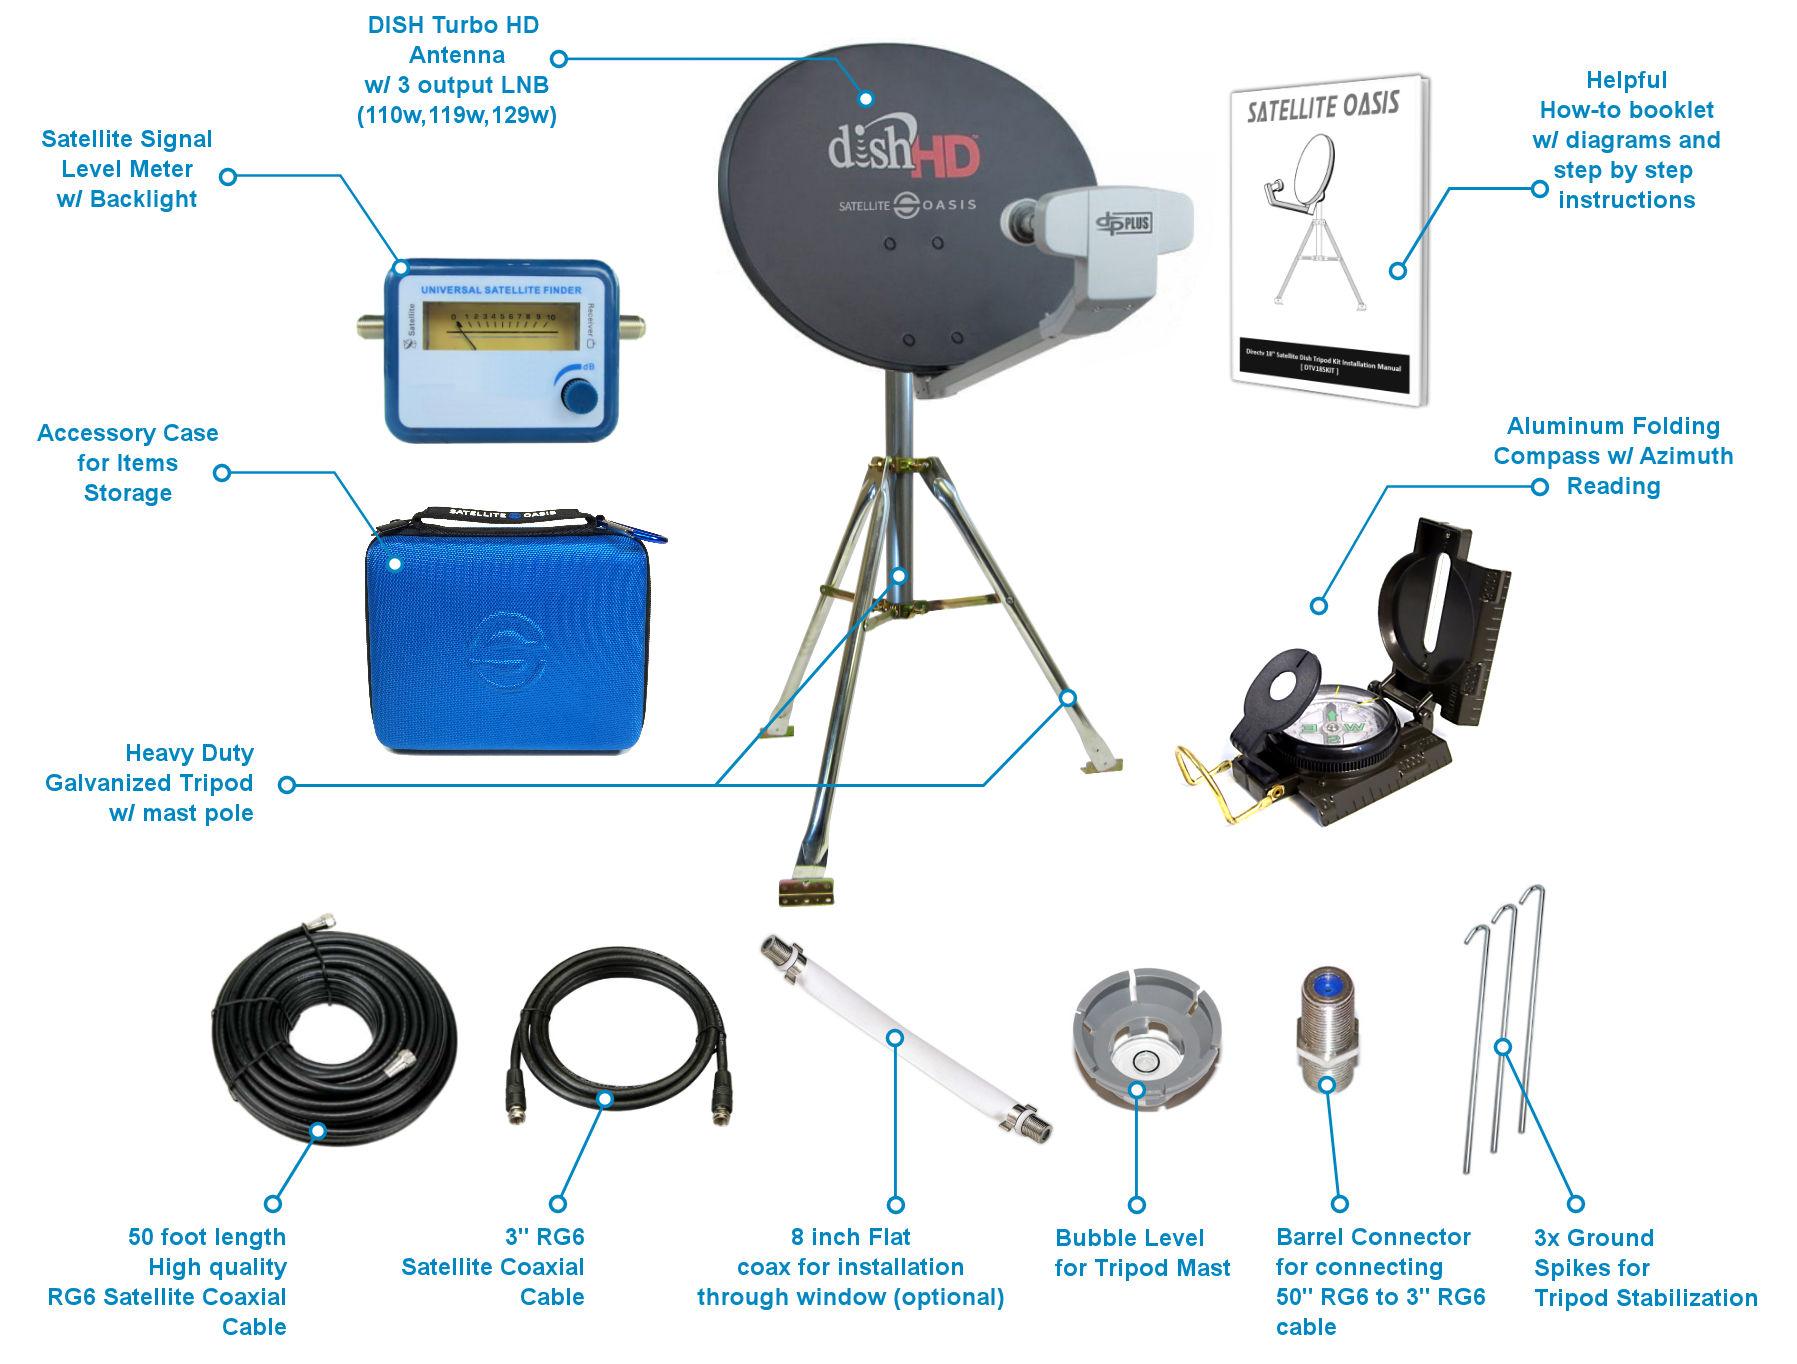 bell hd satellite wiring diagram ethernet wall socket dish network hdtv portable tripod kit for rv